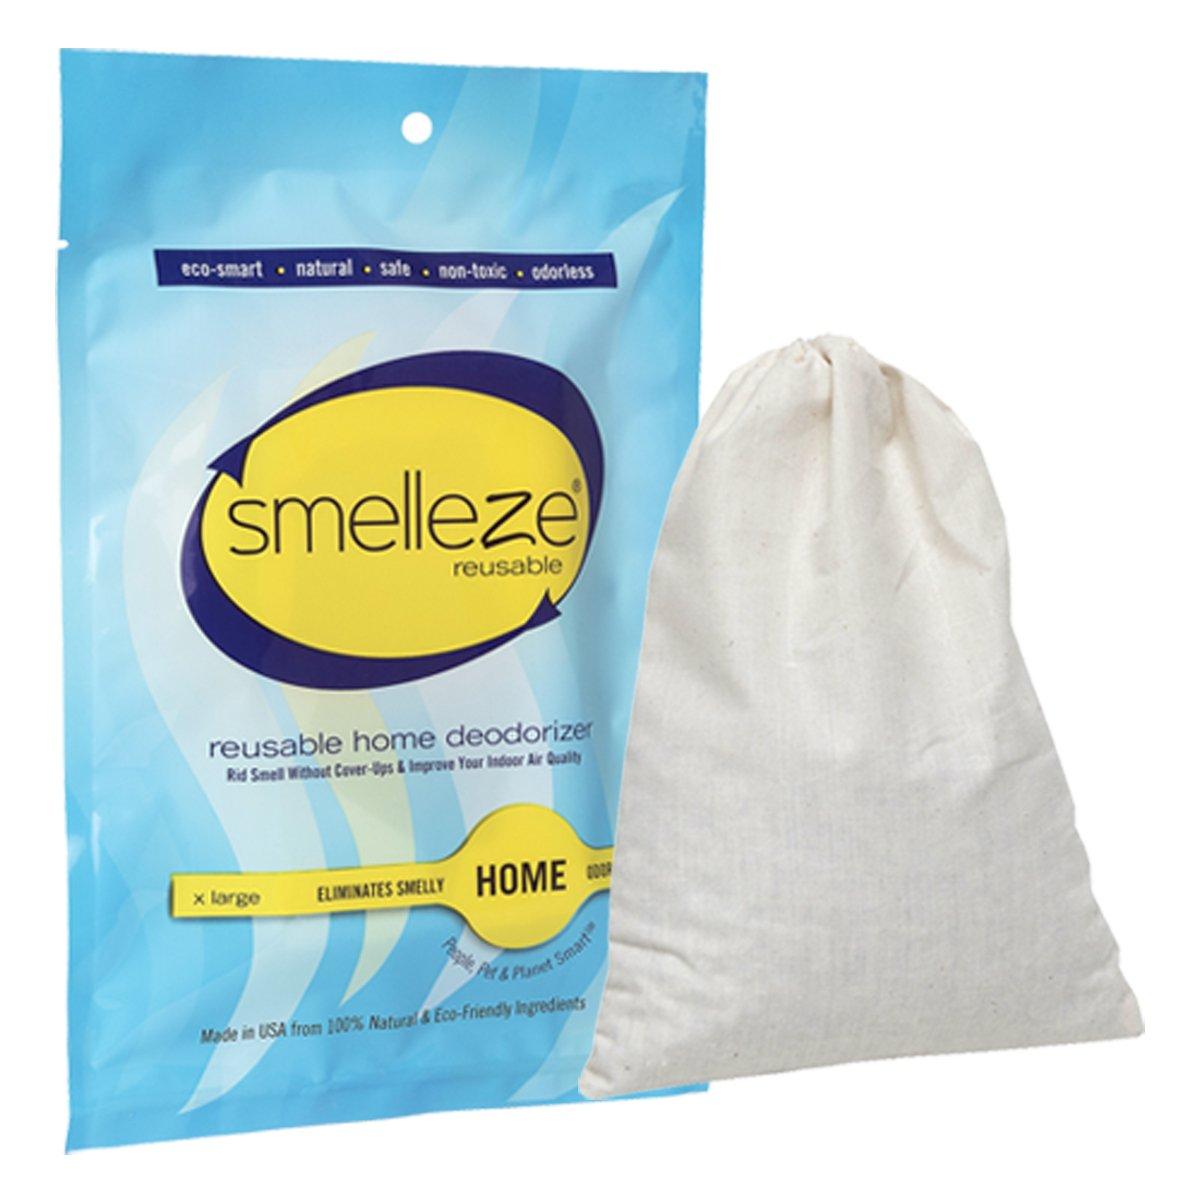 Amazon.com: SMELLEZE Reusable Basement Odor Removal